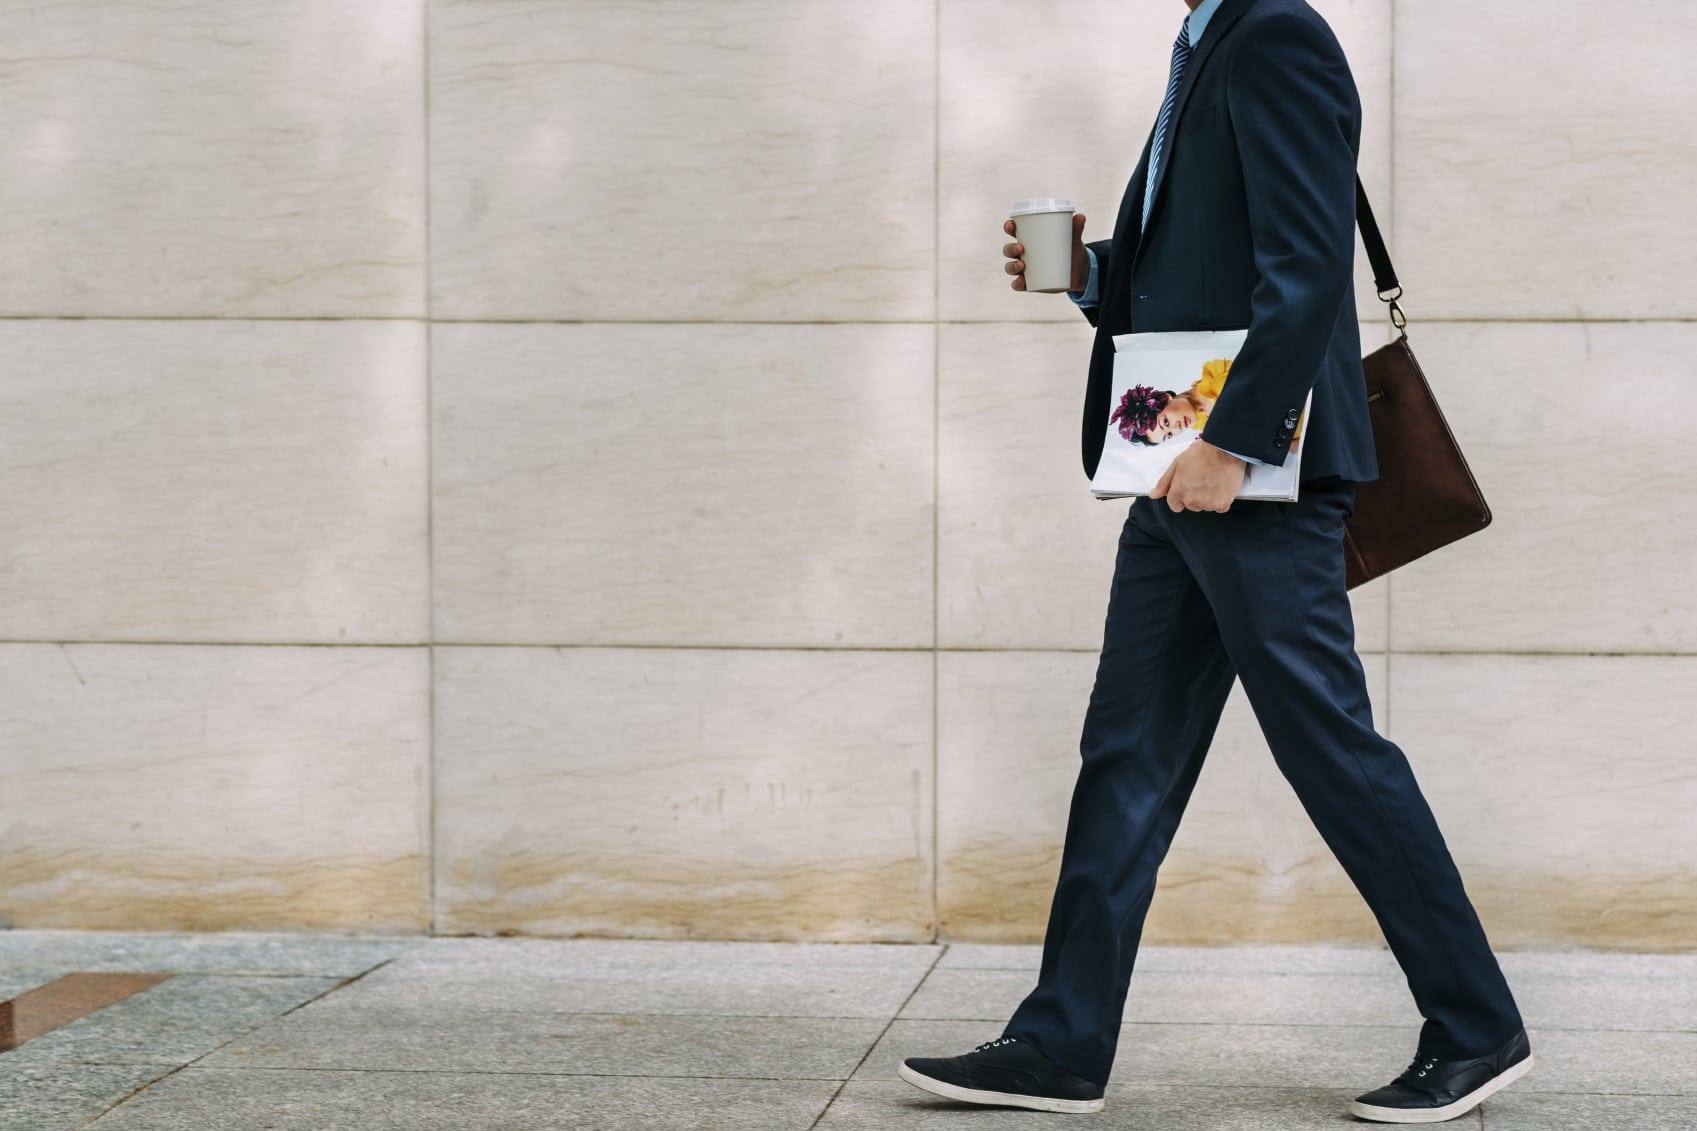 Male Pedestrian Walking Down A City Street Stock Photo